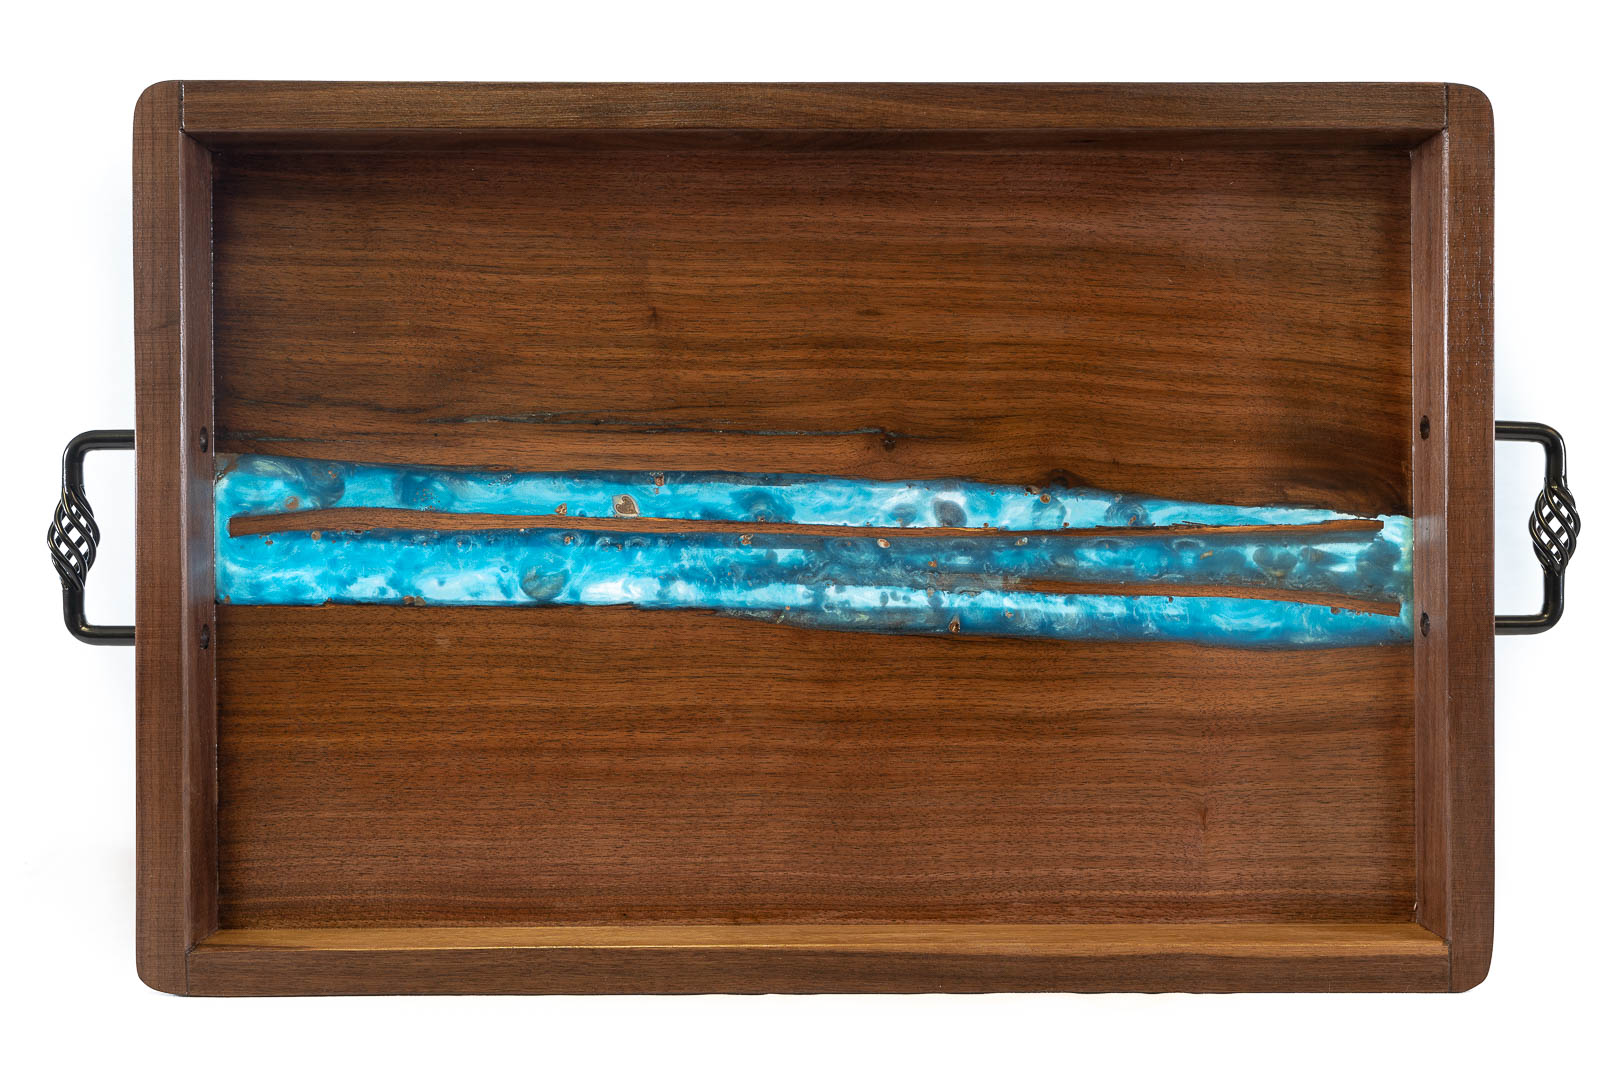 RJC Wood Creations - Serving Tray Blue Resin (3).jpg